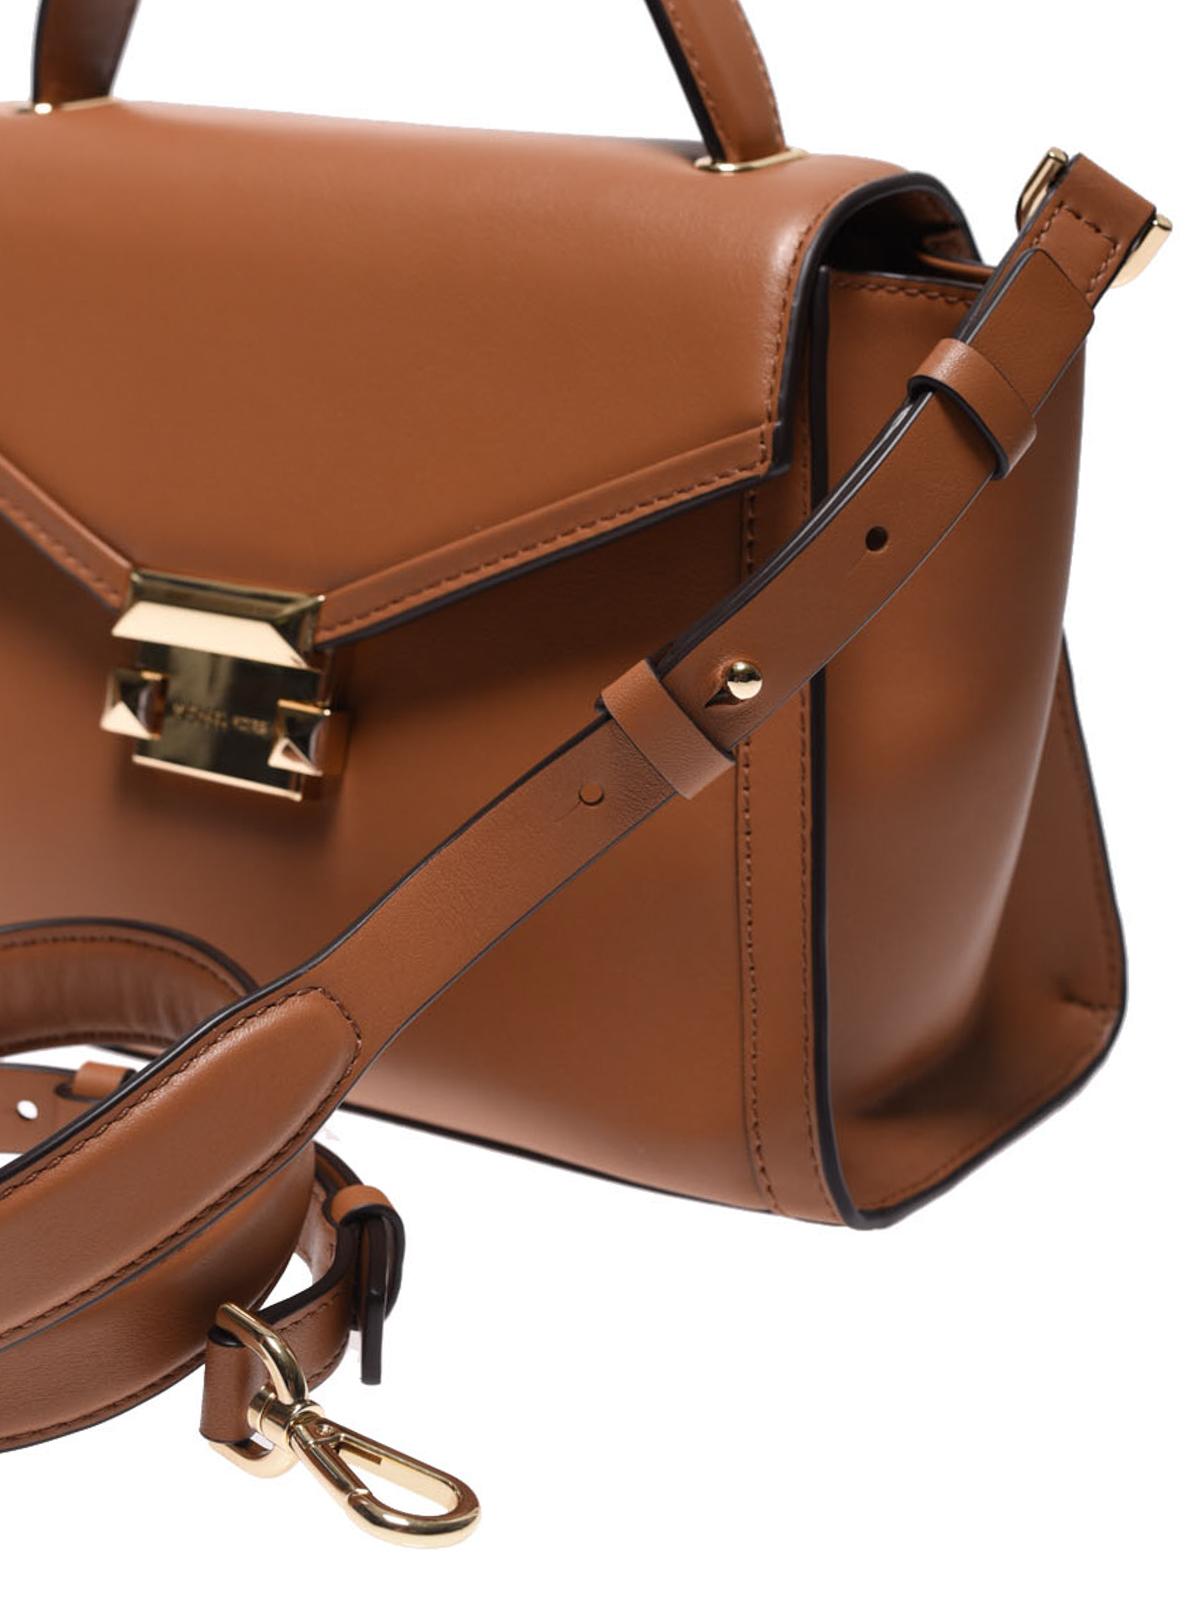 22587ddfd996 Michael Kors - Whitney medium satchel - shoulder bags - 30T8GXIS2L 203